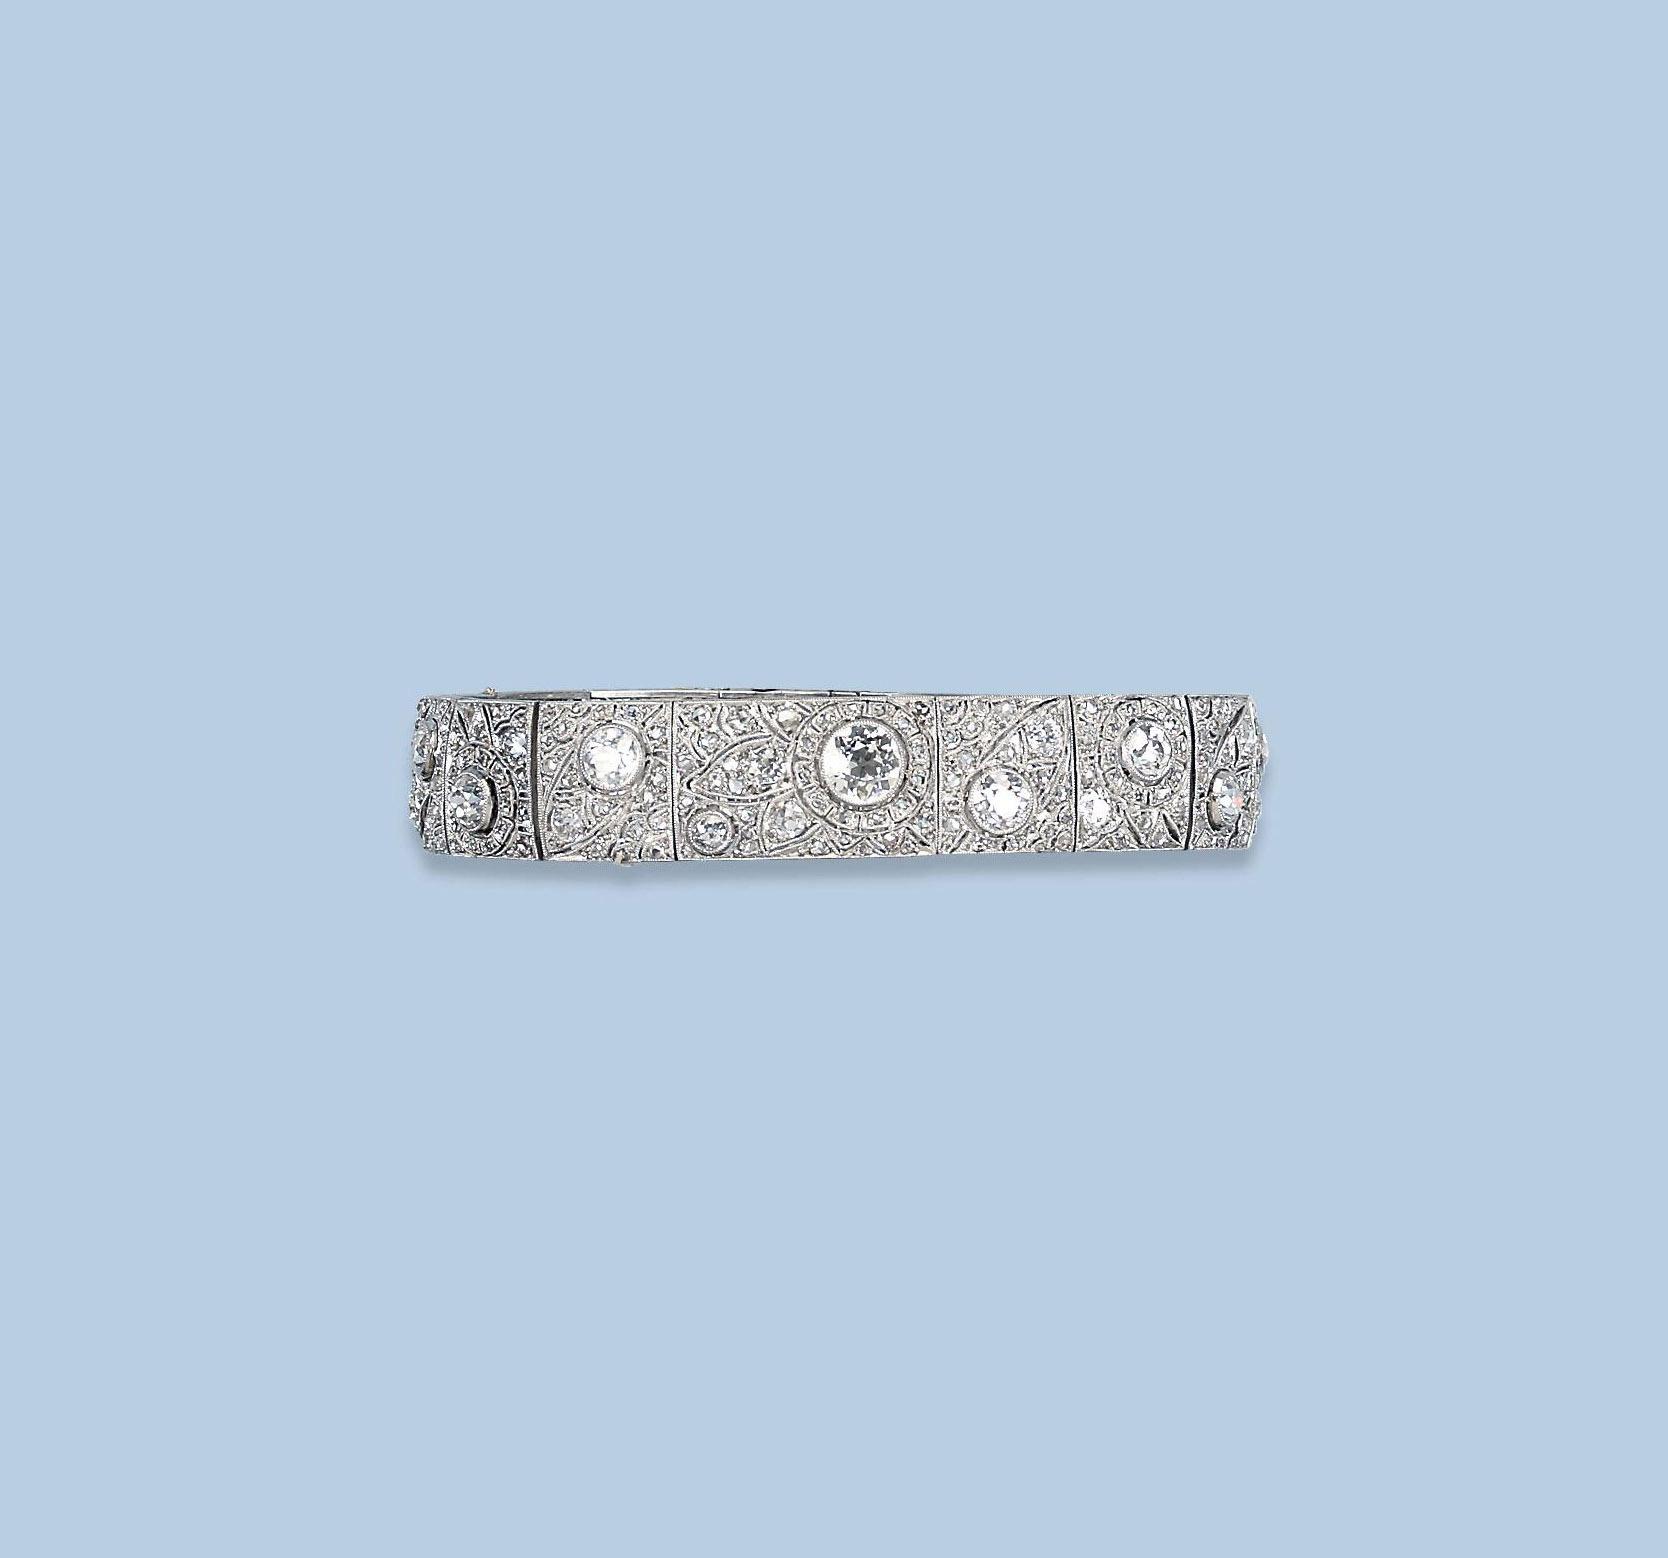 A BELLE EPOQUE DIAMOND BRACELET